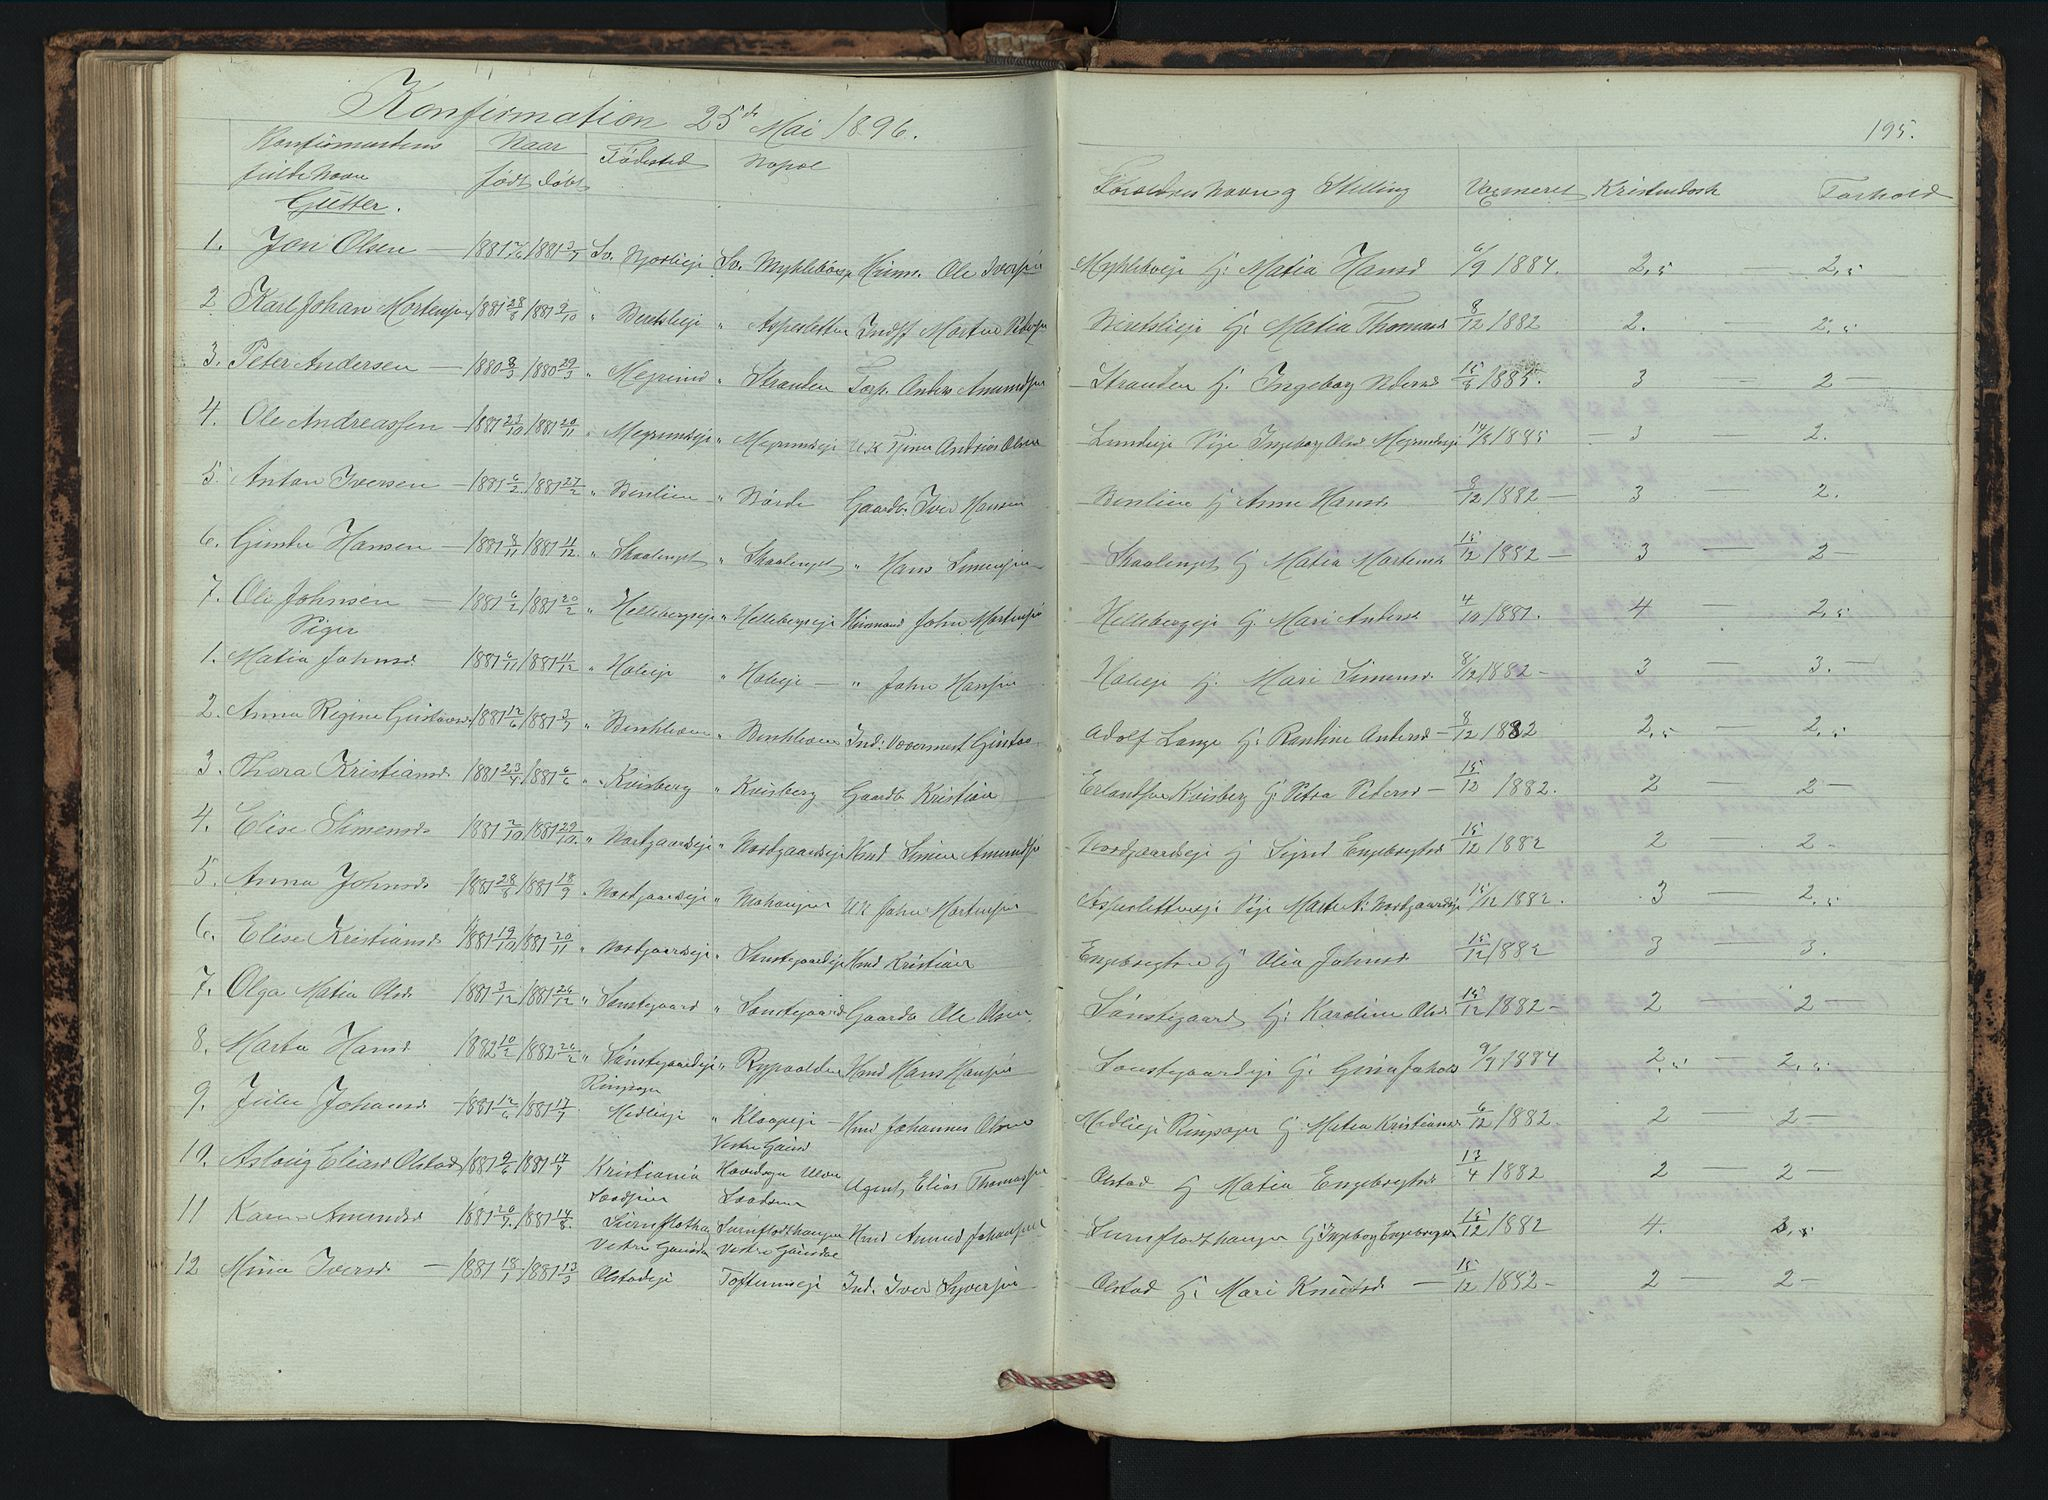 SAH, Vestre Gausdal prestekontor, Klokkerbok nr. 2, 1874-1897, s. 195